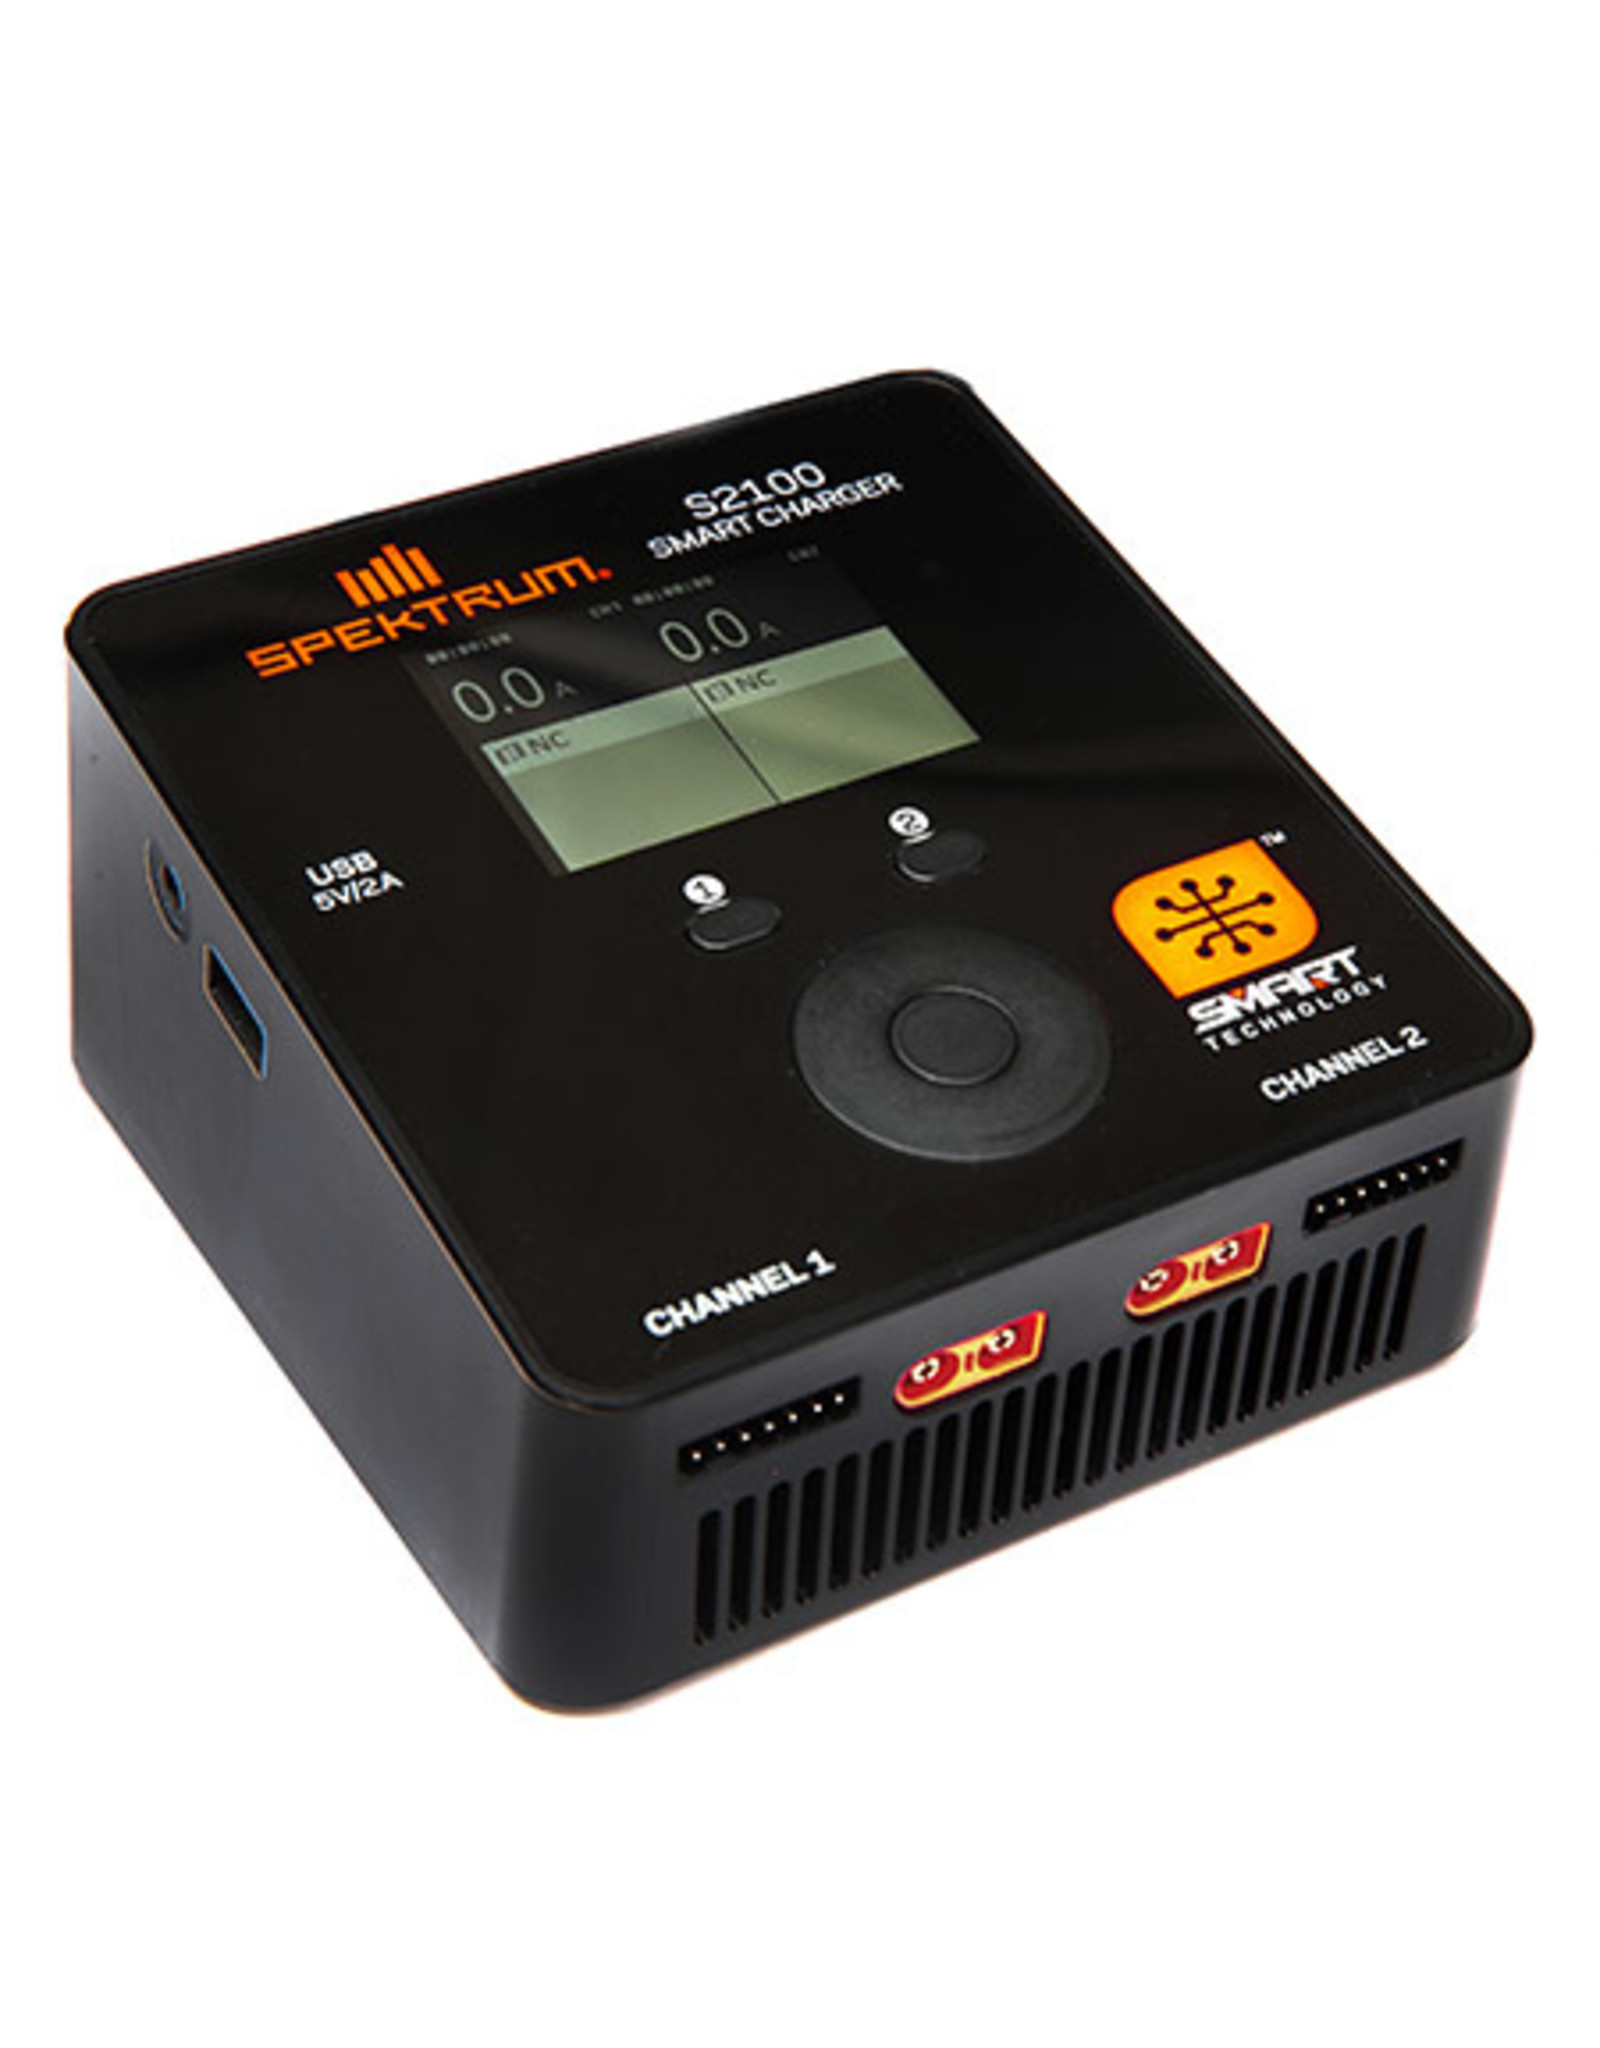 Spektrum Spektrum Smart S2100 AC Charger, 2x100W (SPMXC1010)